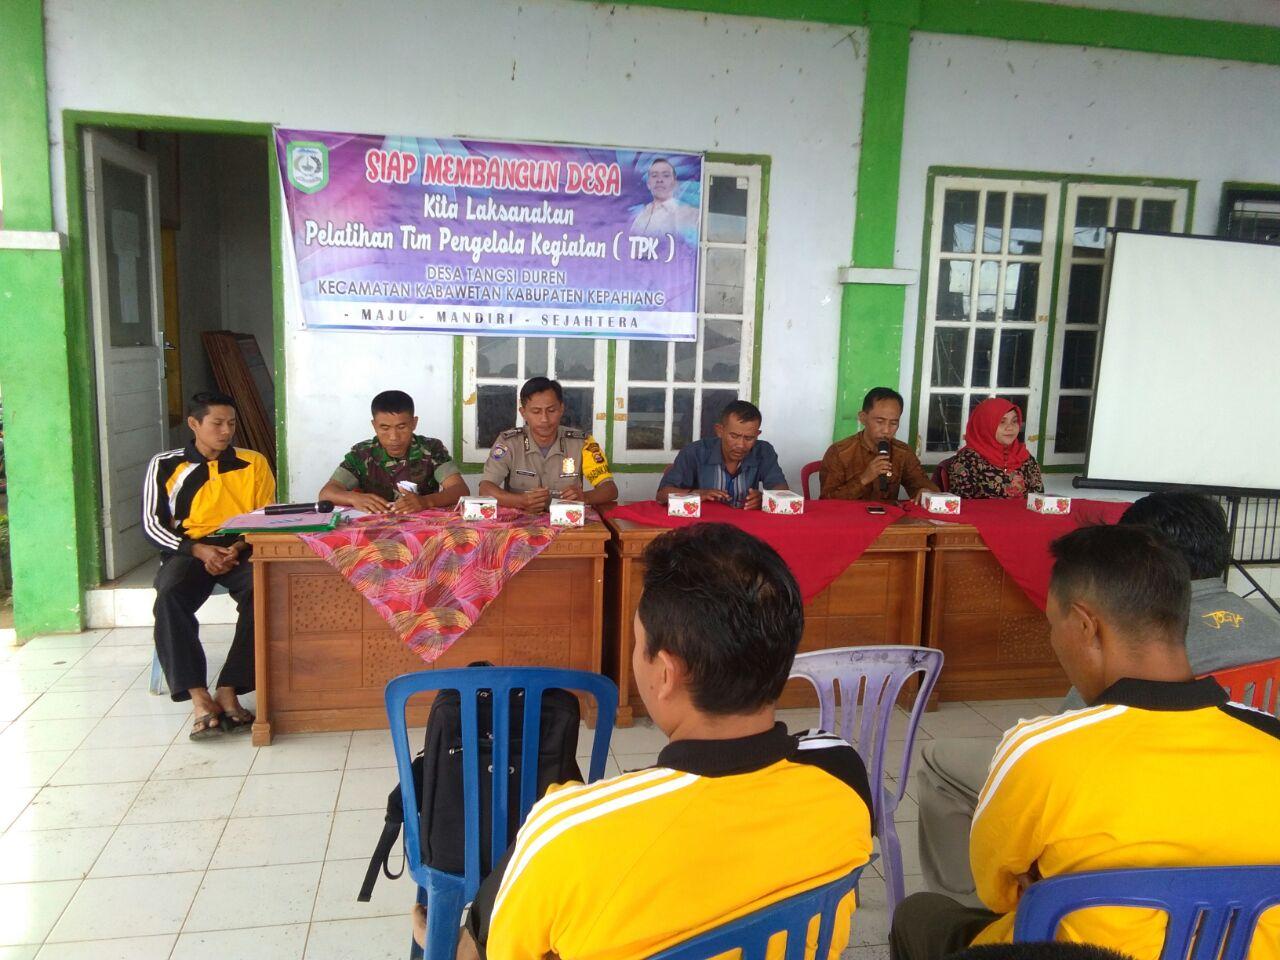 Kompak,.. 3 Pilar Desa Tangsi Duren, Duduk Bersama Buka Pelatihan TPK